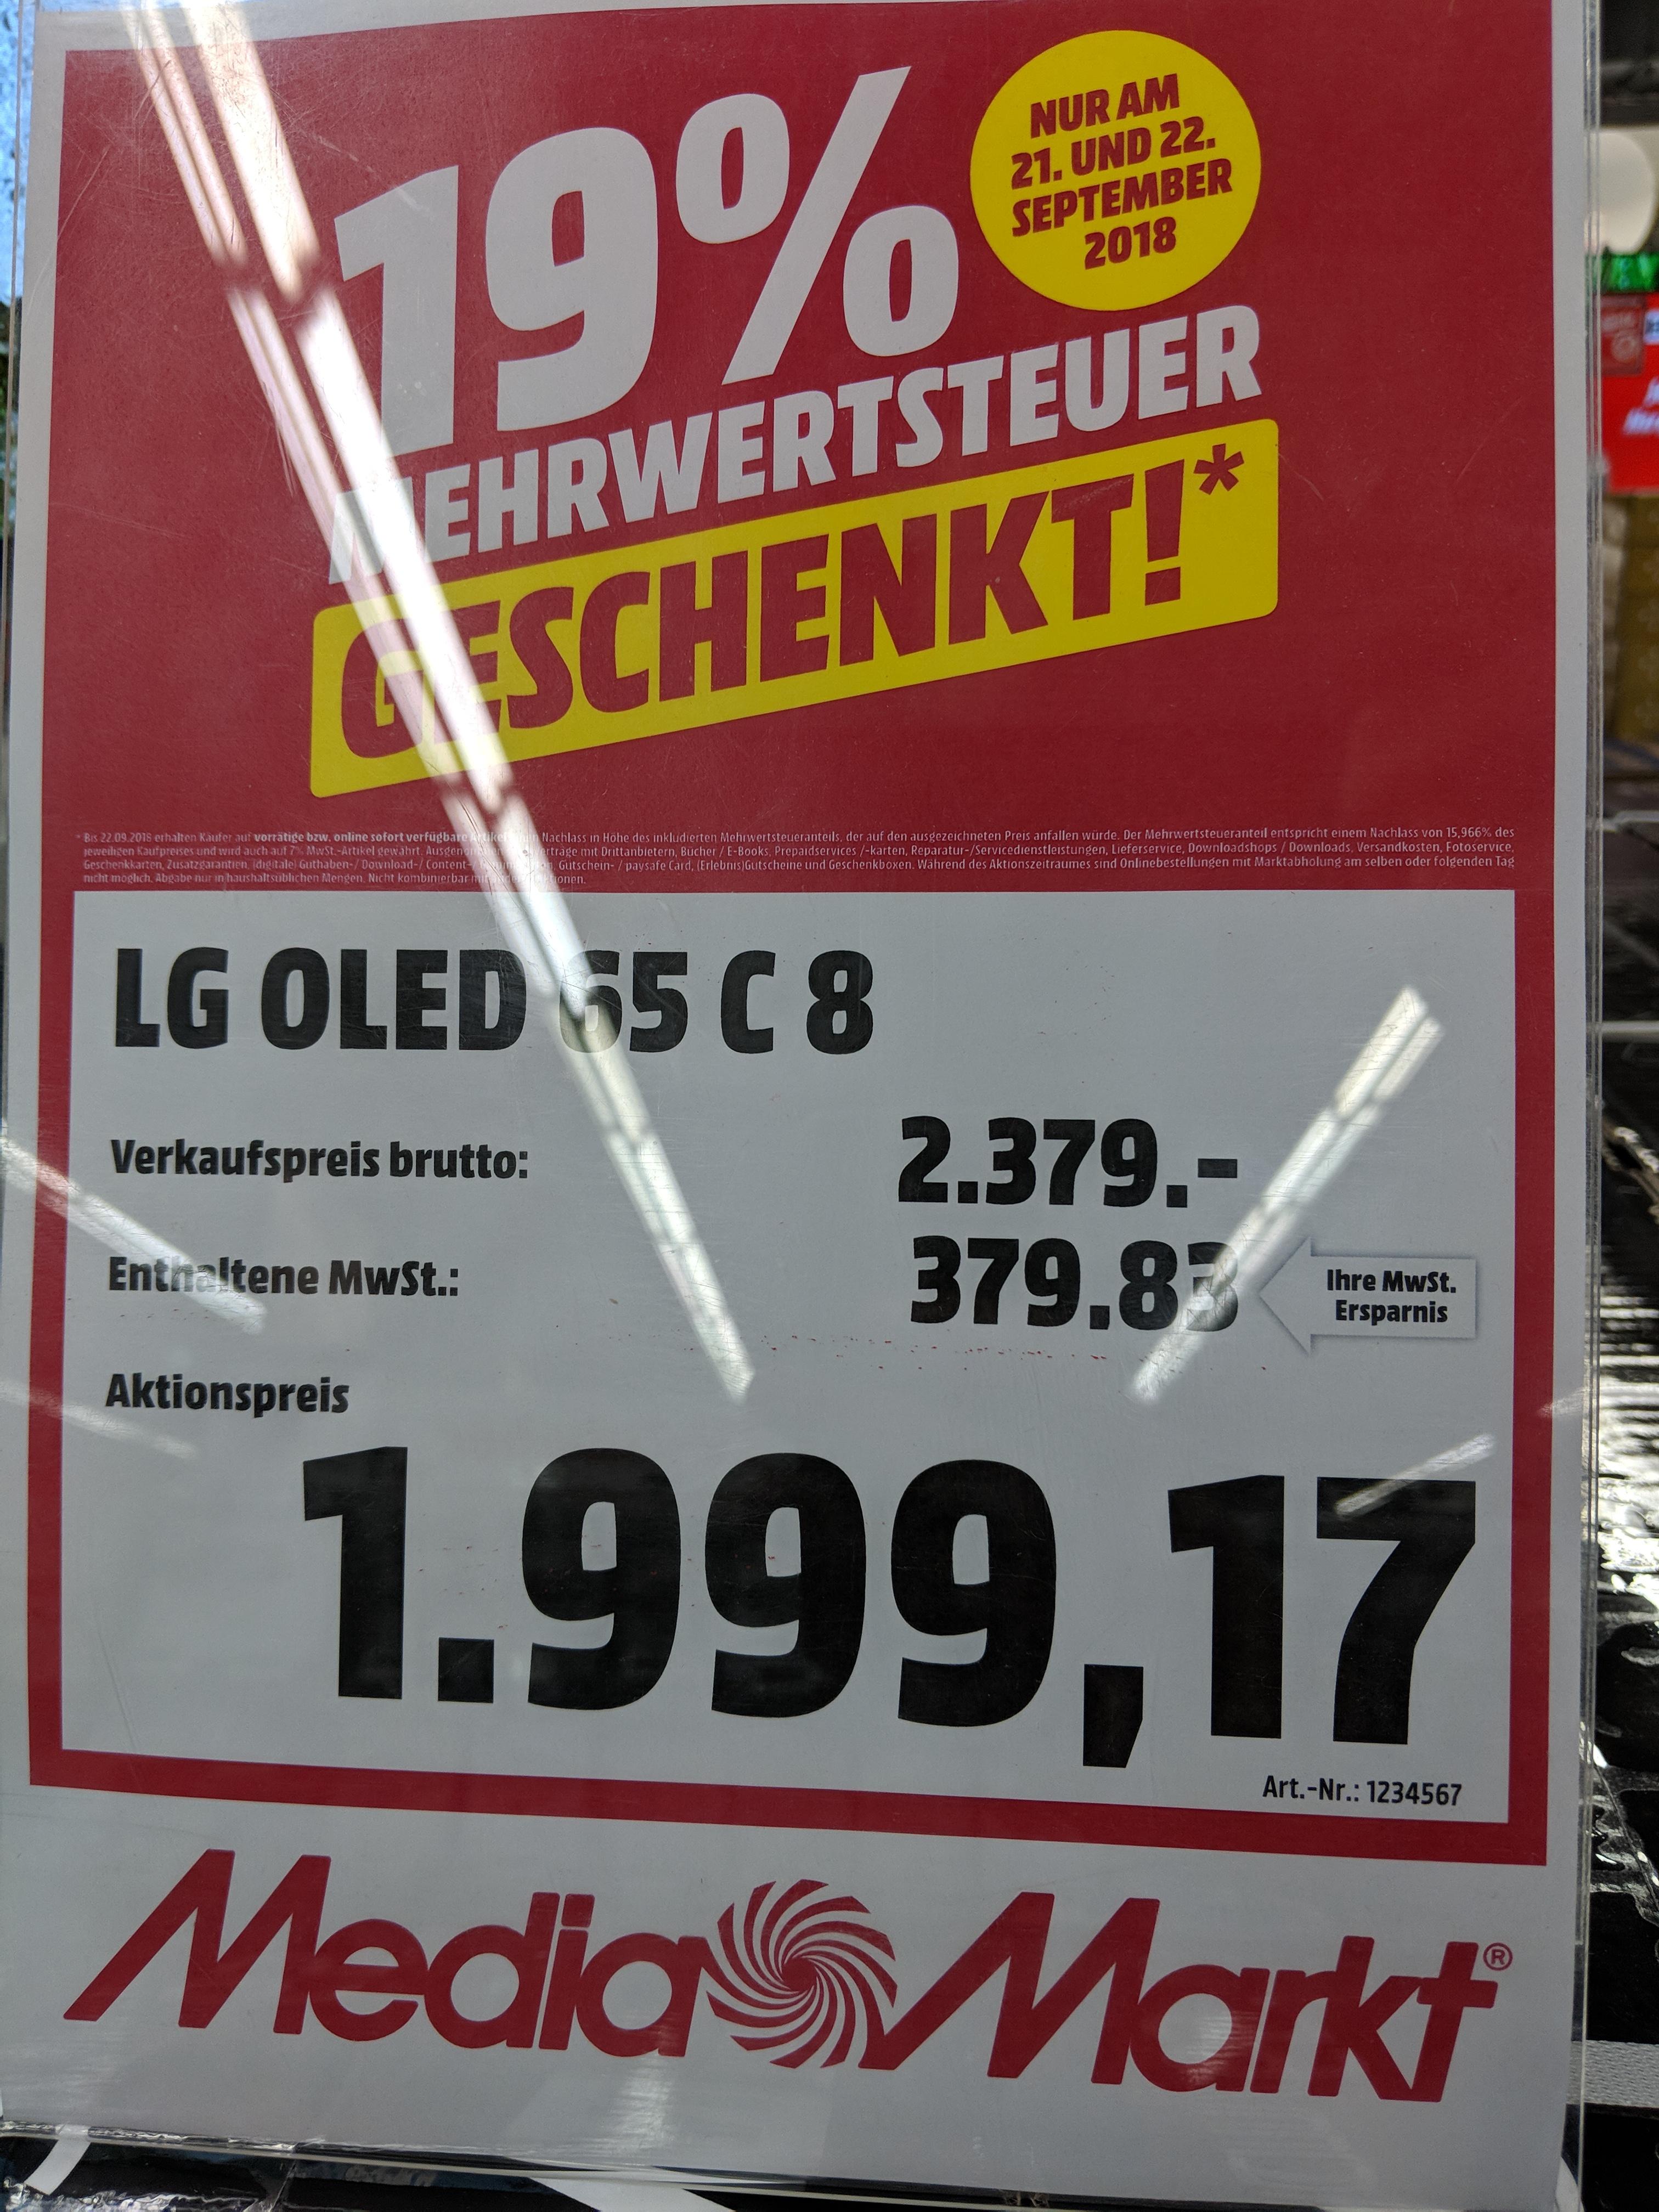 OLED TV LG 65 C8 dank 19% MwSt neuer BESTPREIS [Lokal MM Köln Kalk] 65C8